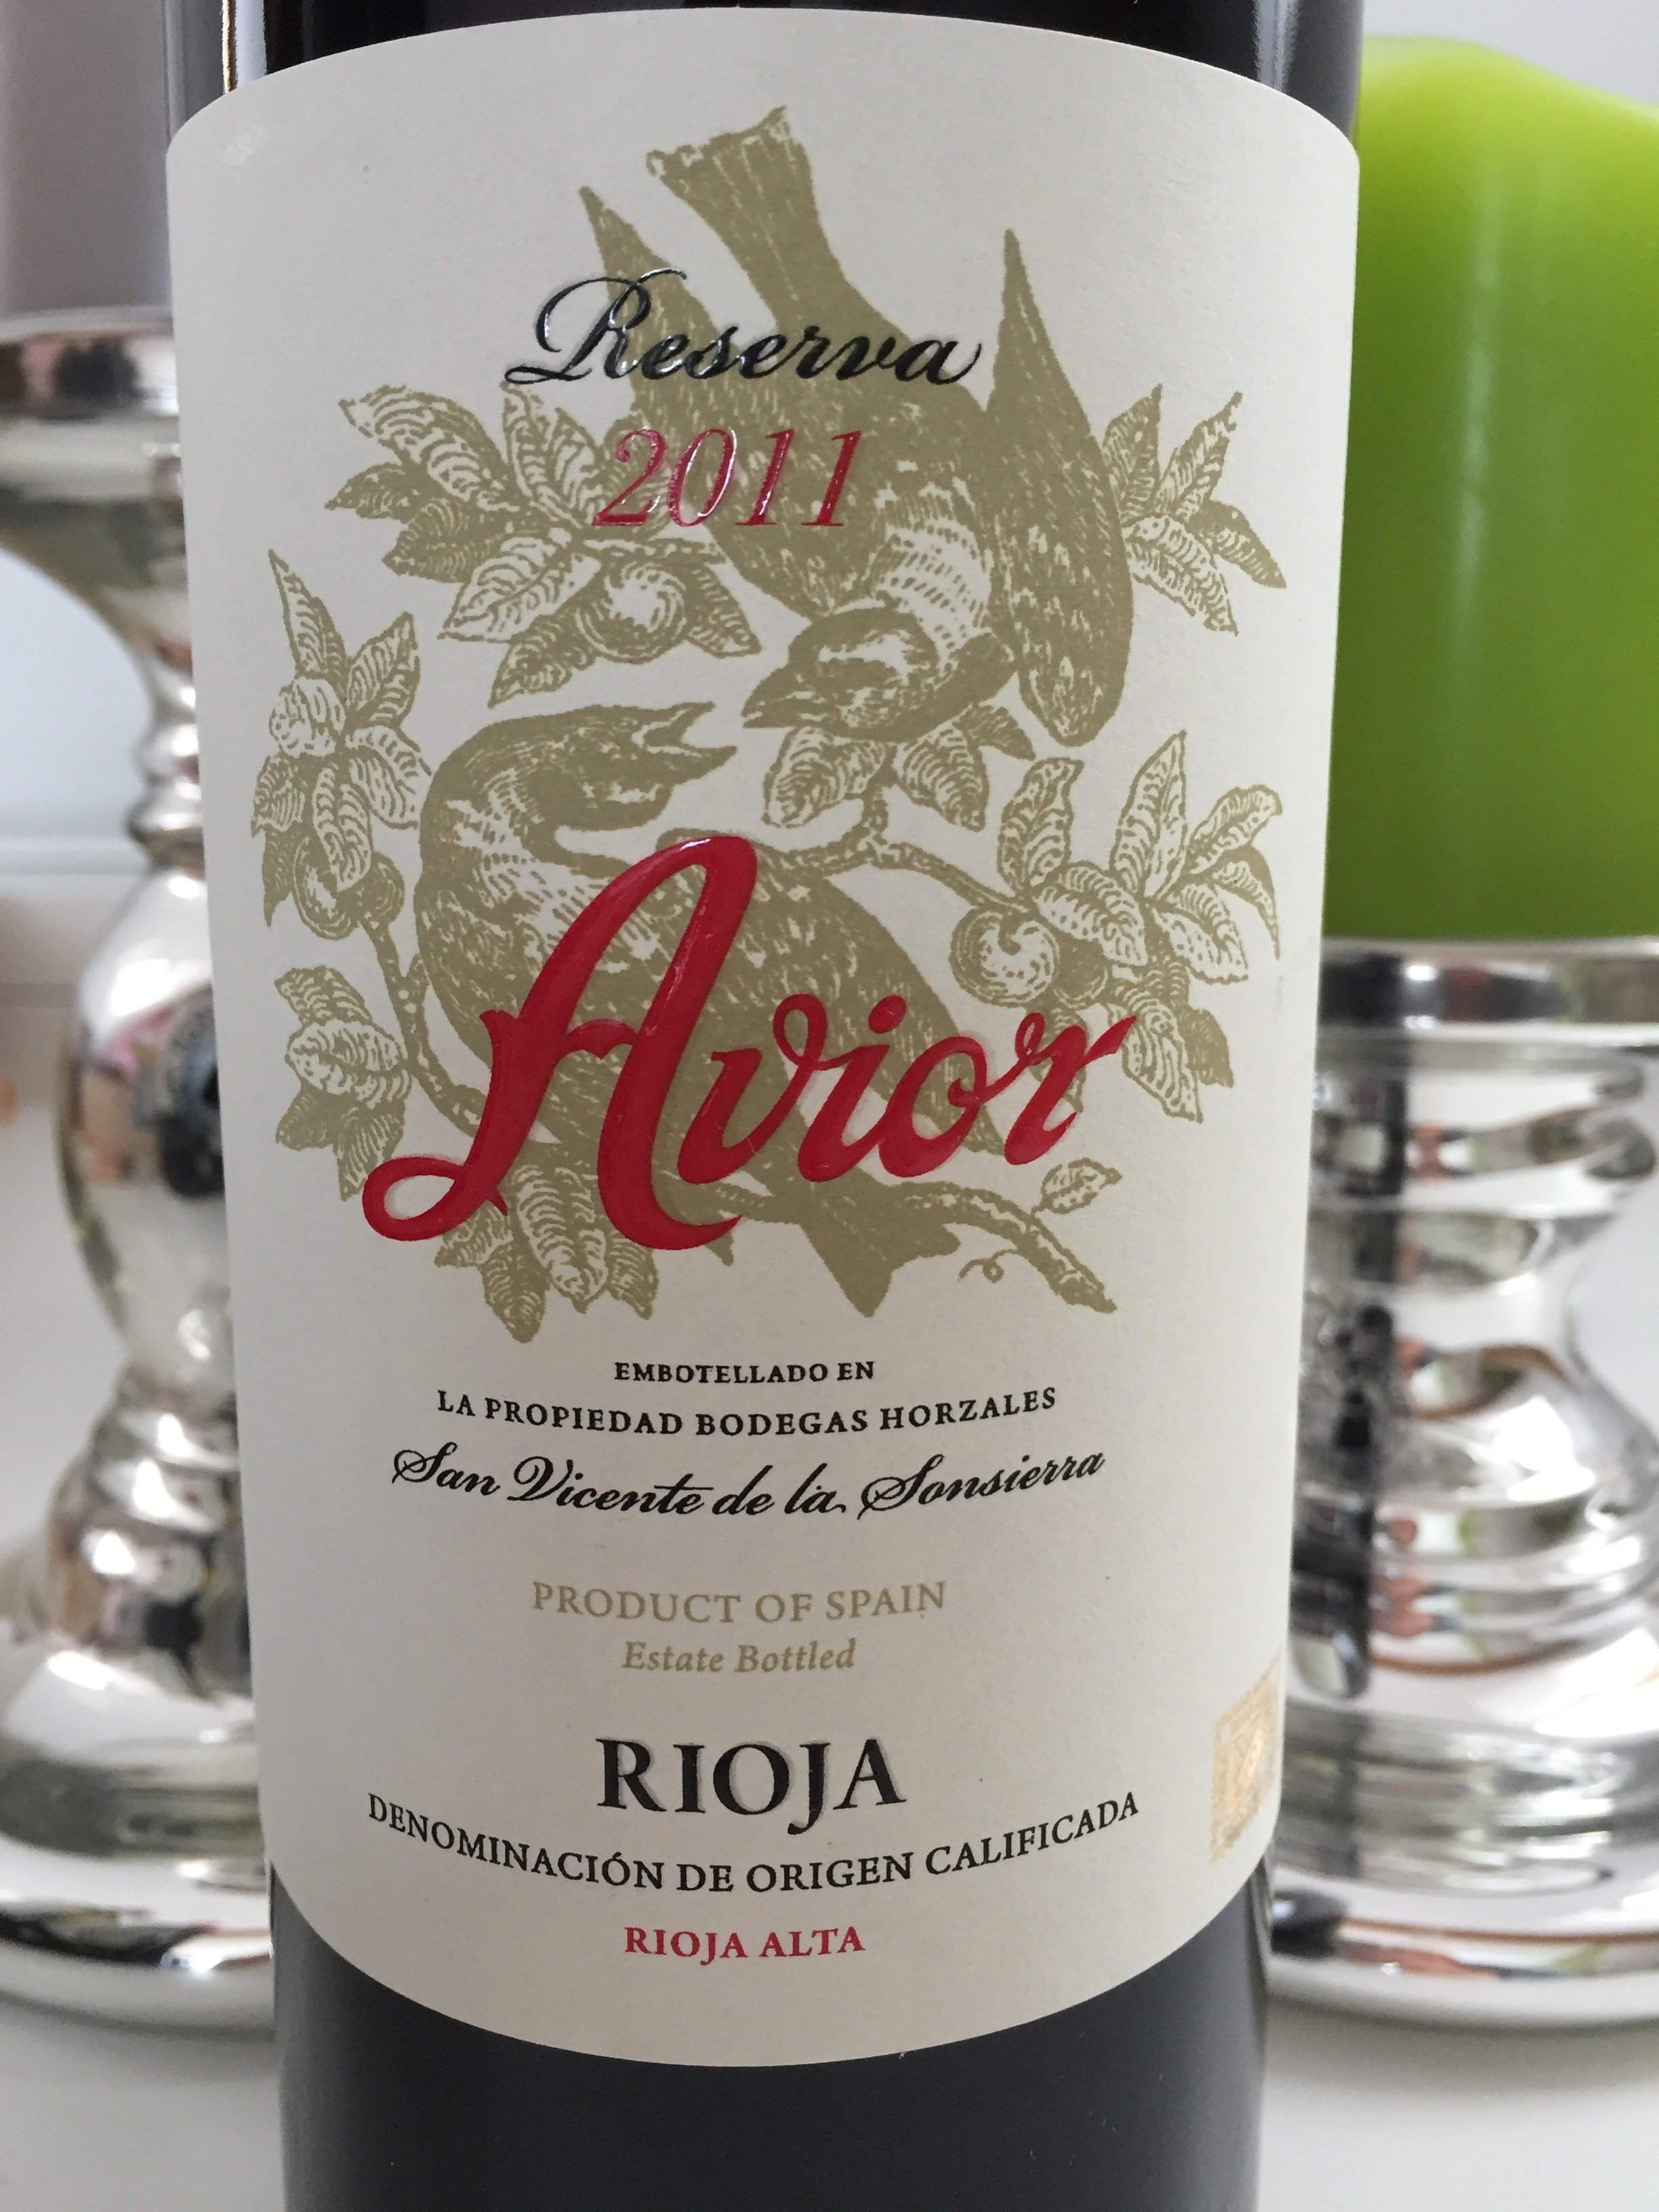 Avior Rioja Reserva 2011